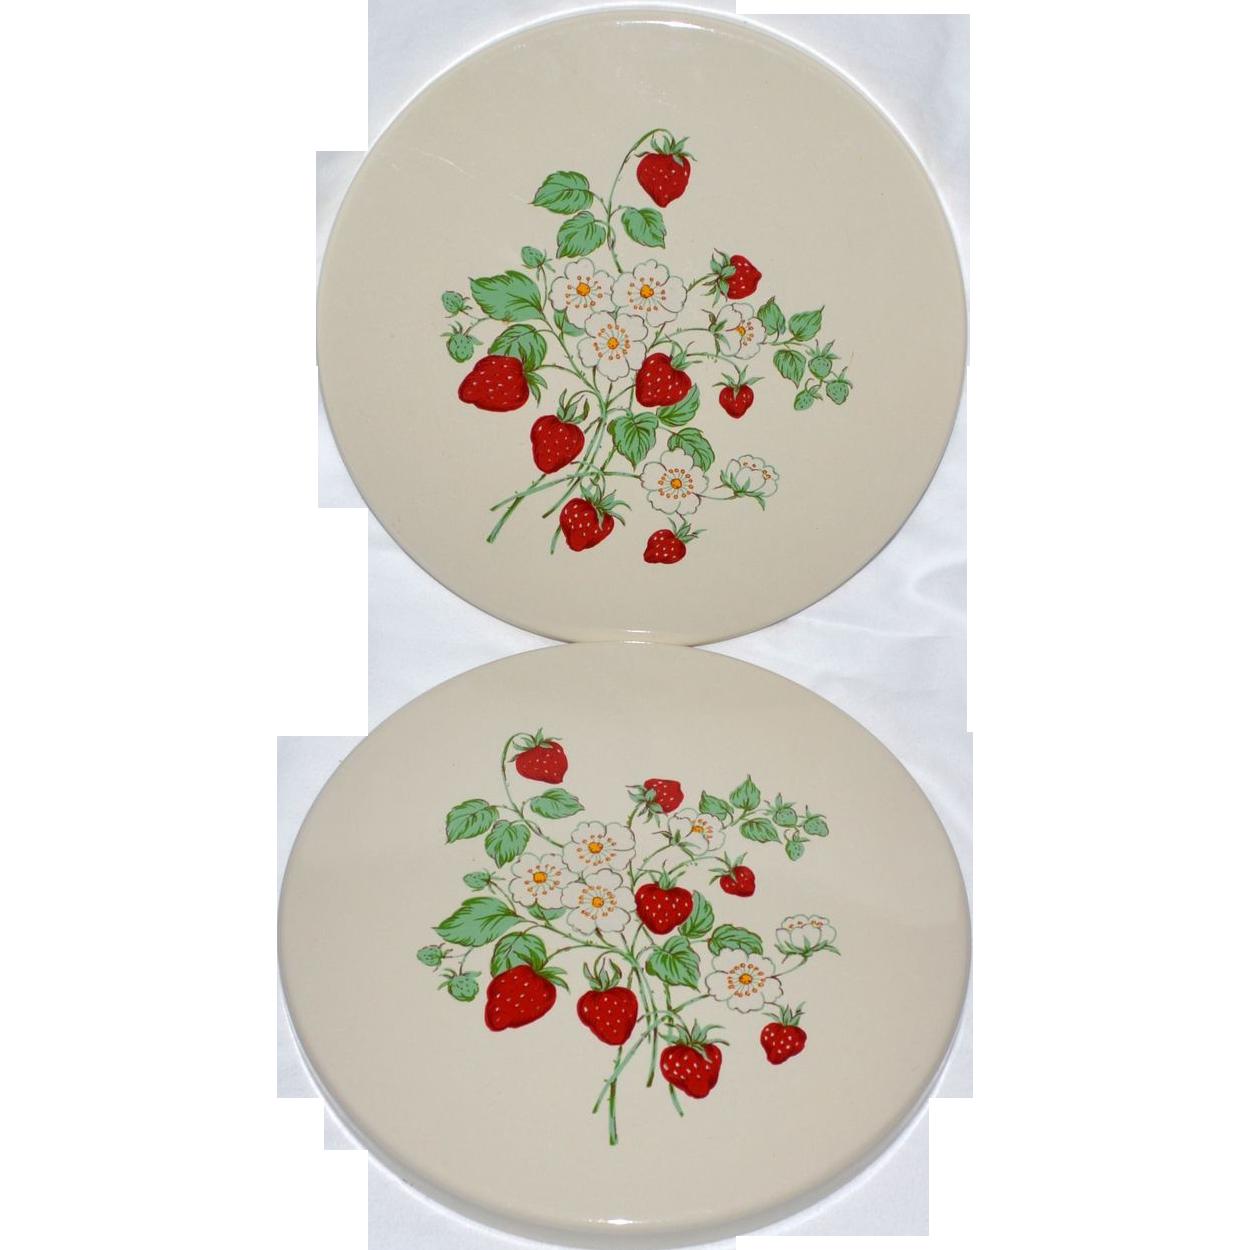 Porcelain Electric Stove Burner Covers